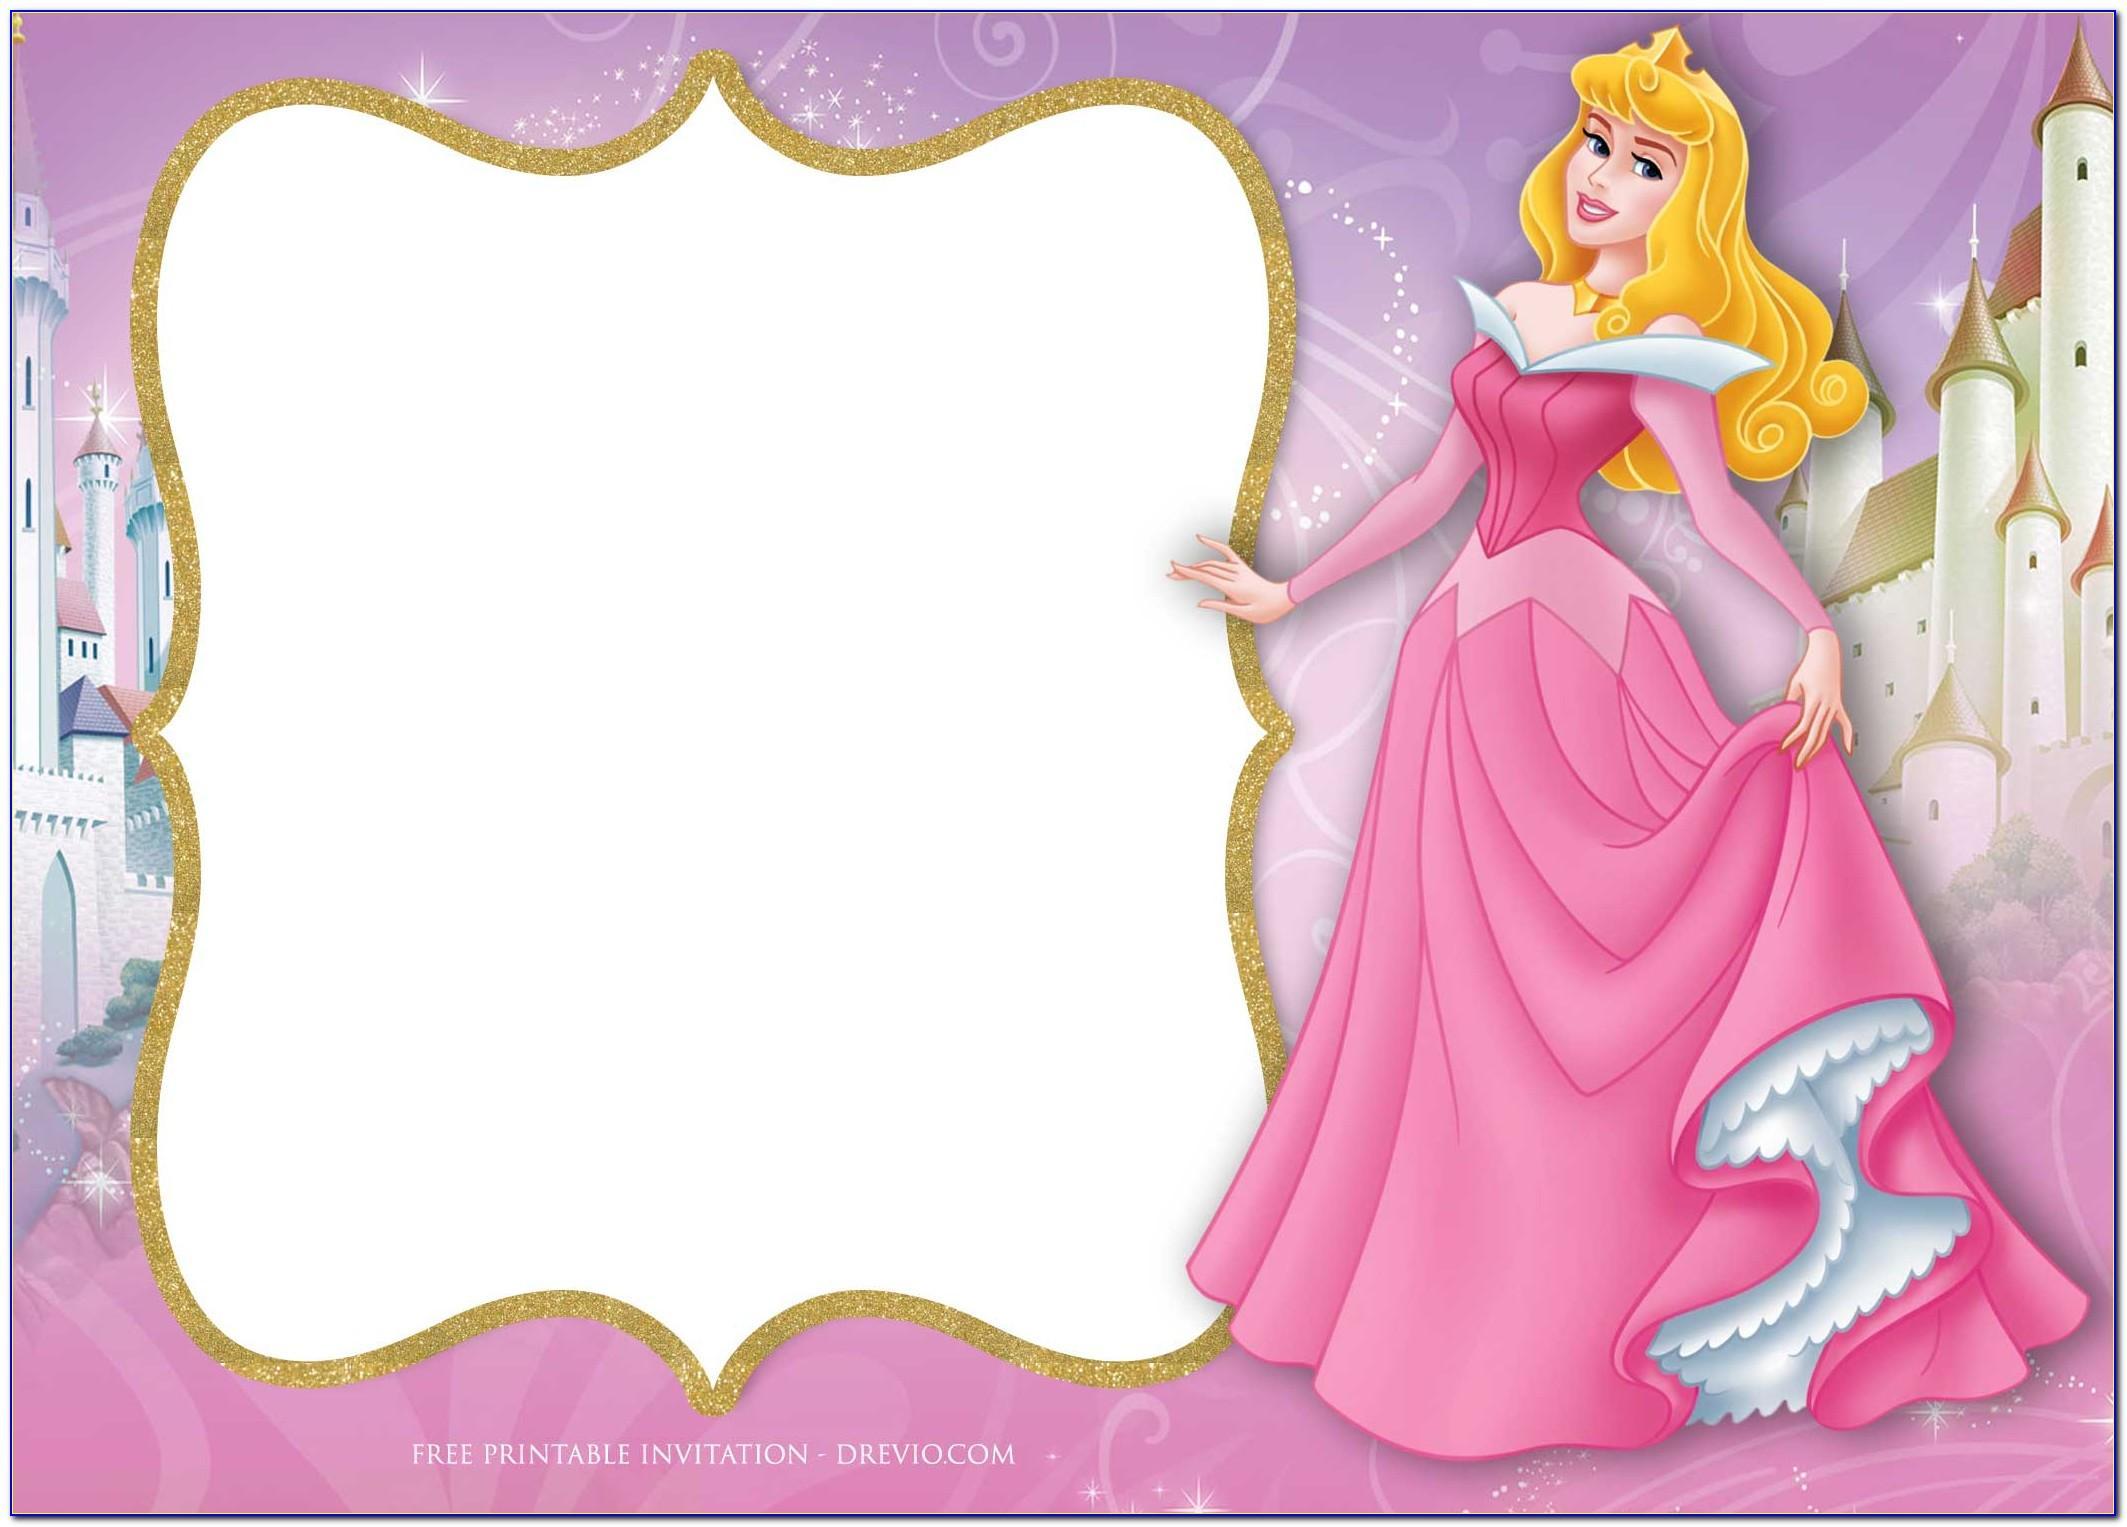 Princess Dress Invitation Templates Free